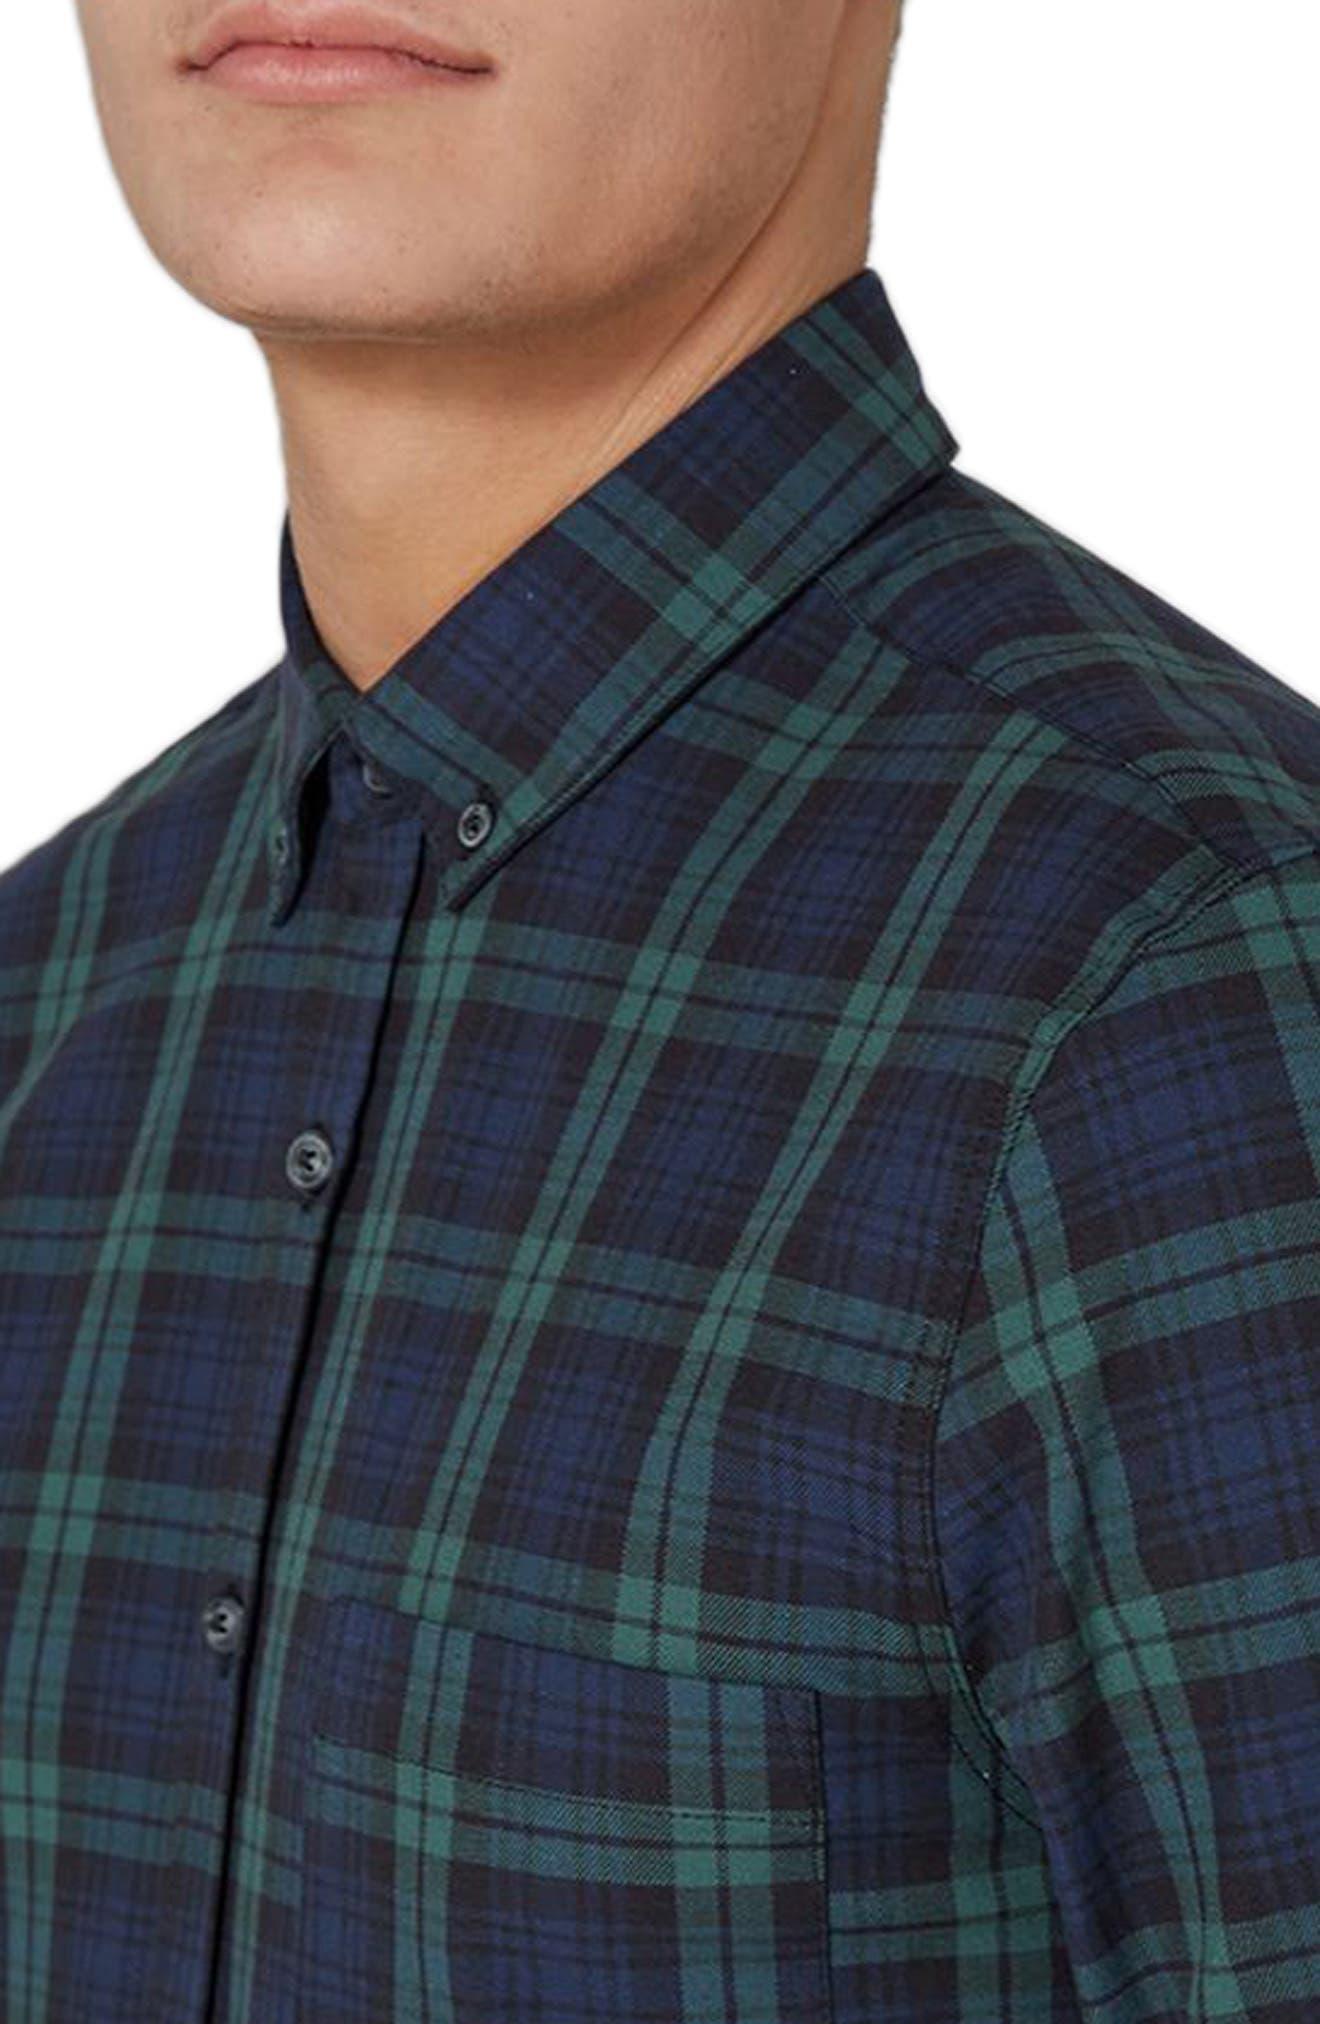 Muscle Fit Black Watch Plaid Shirt,                             Alternate thumbnail 3, color,                             Green Multi